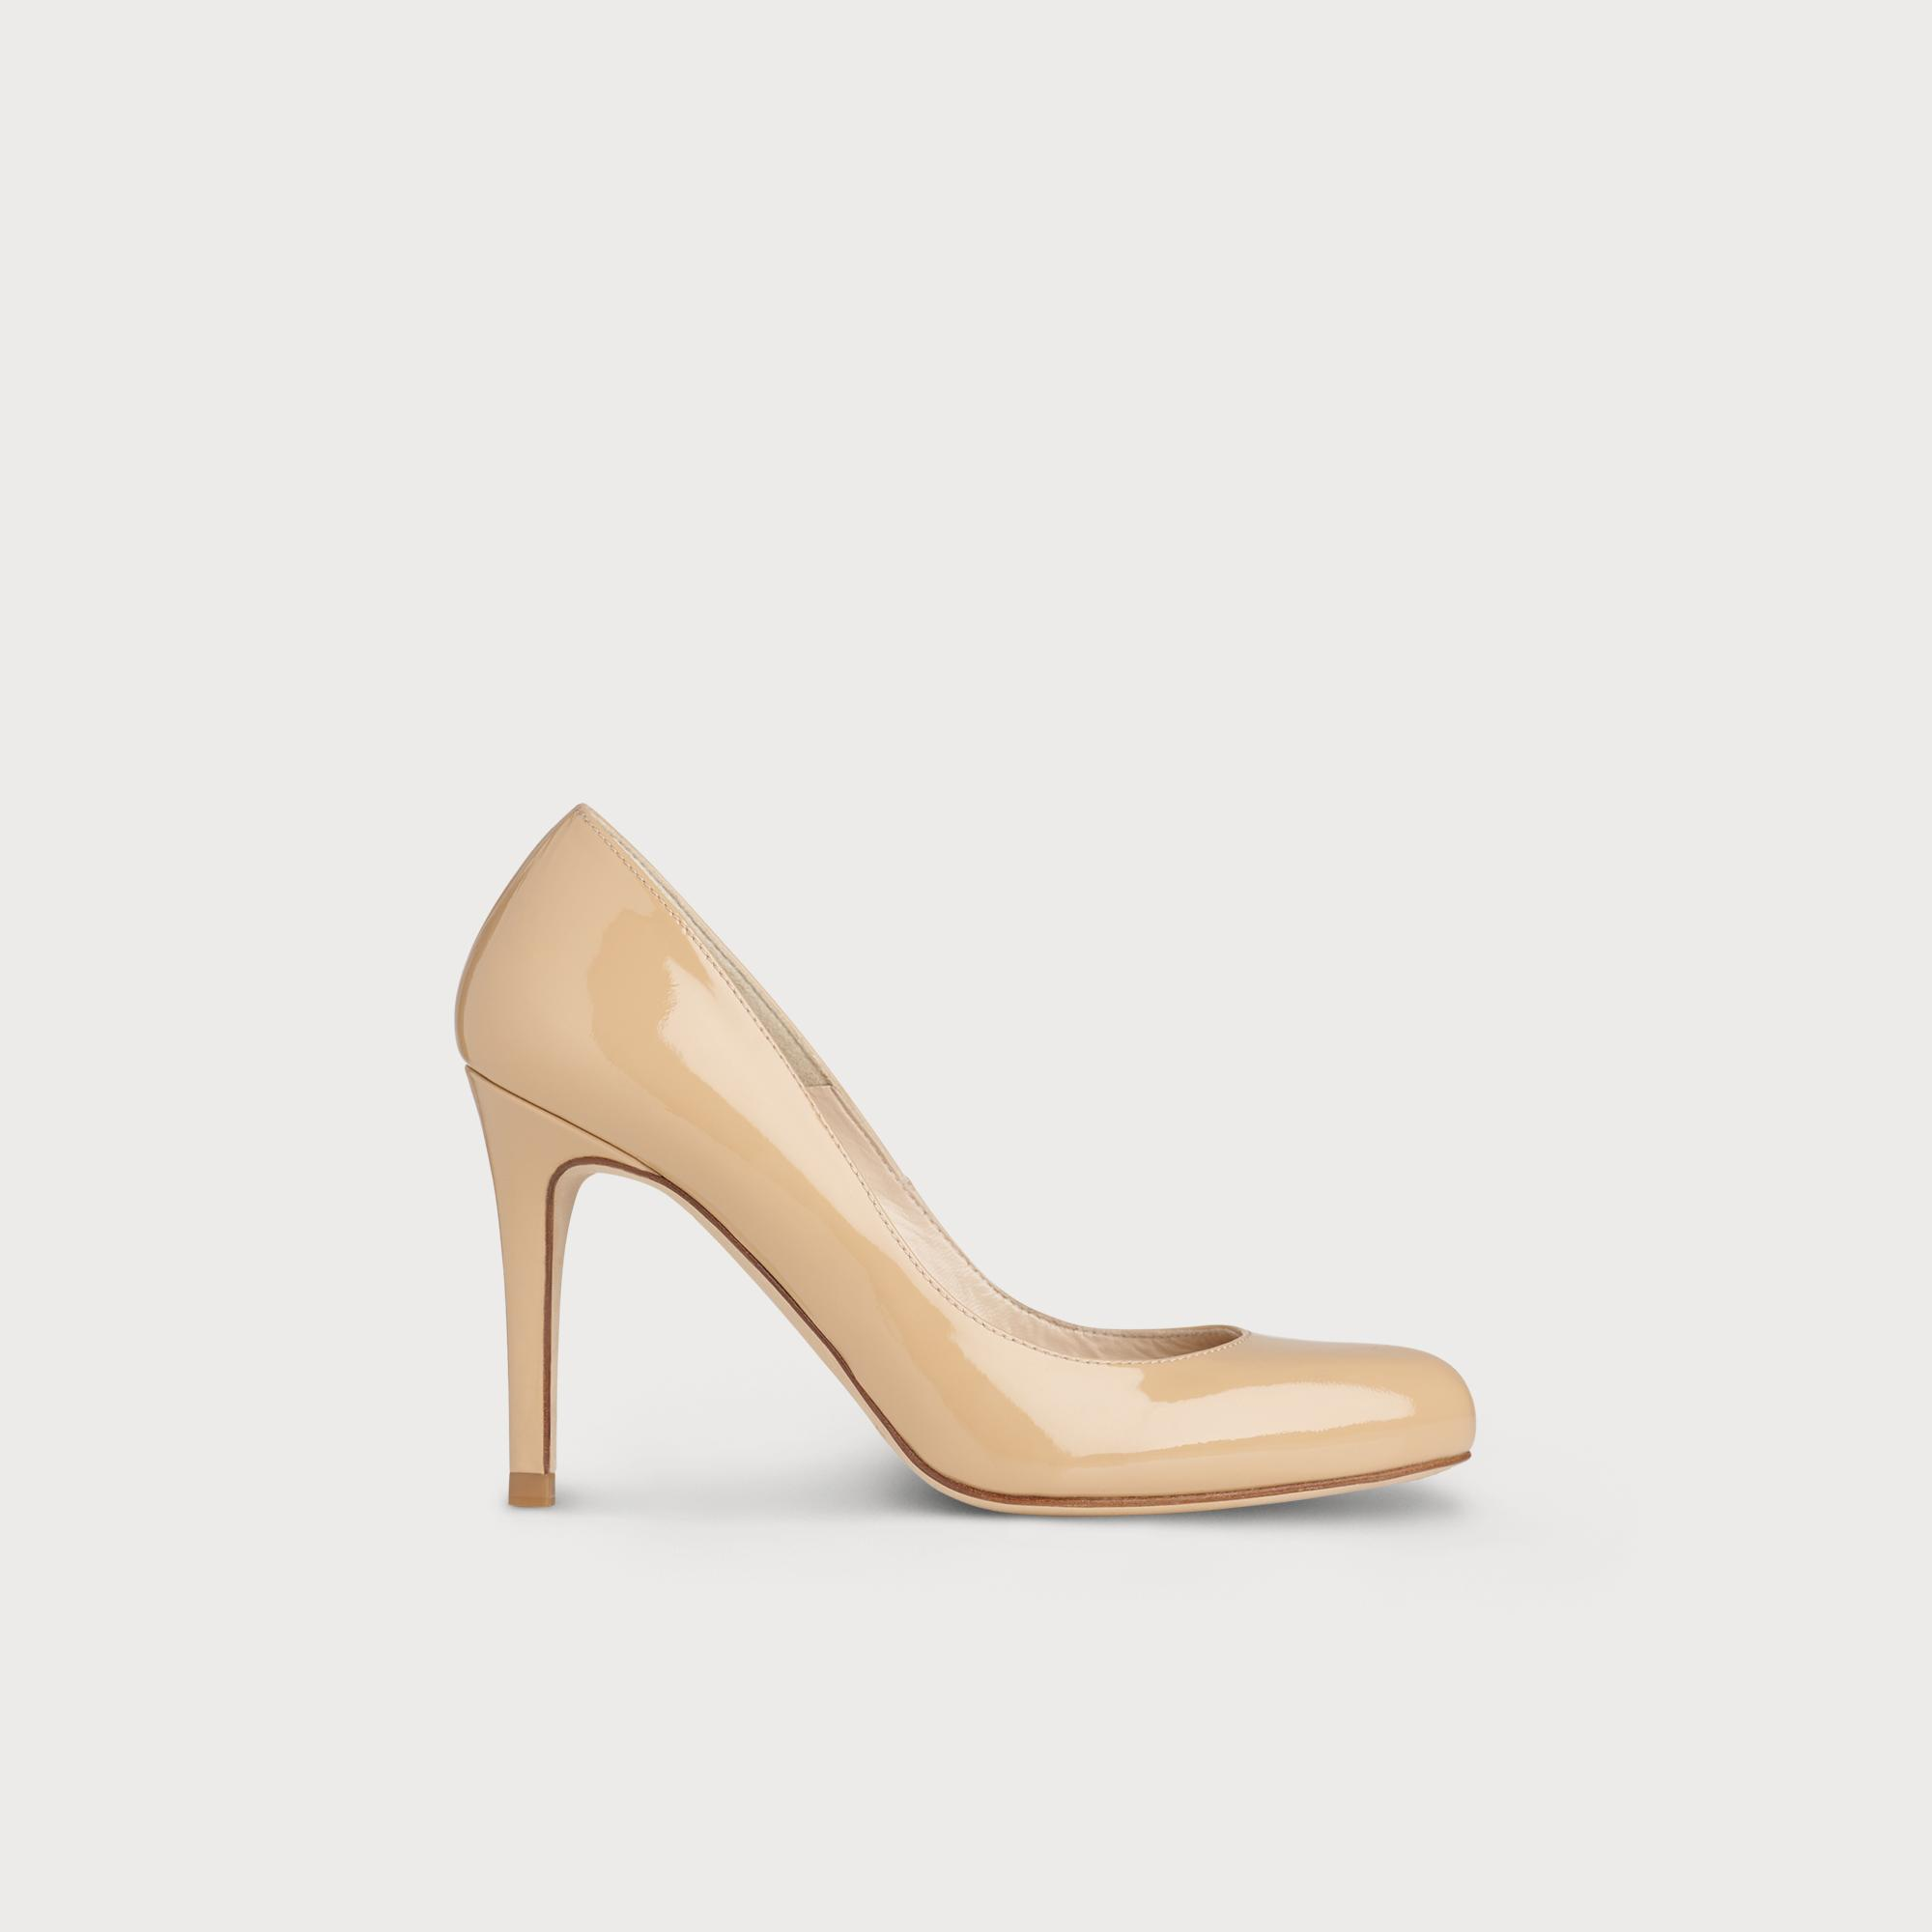 Stila Trench Patent Heel